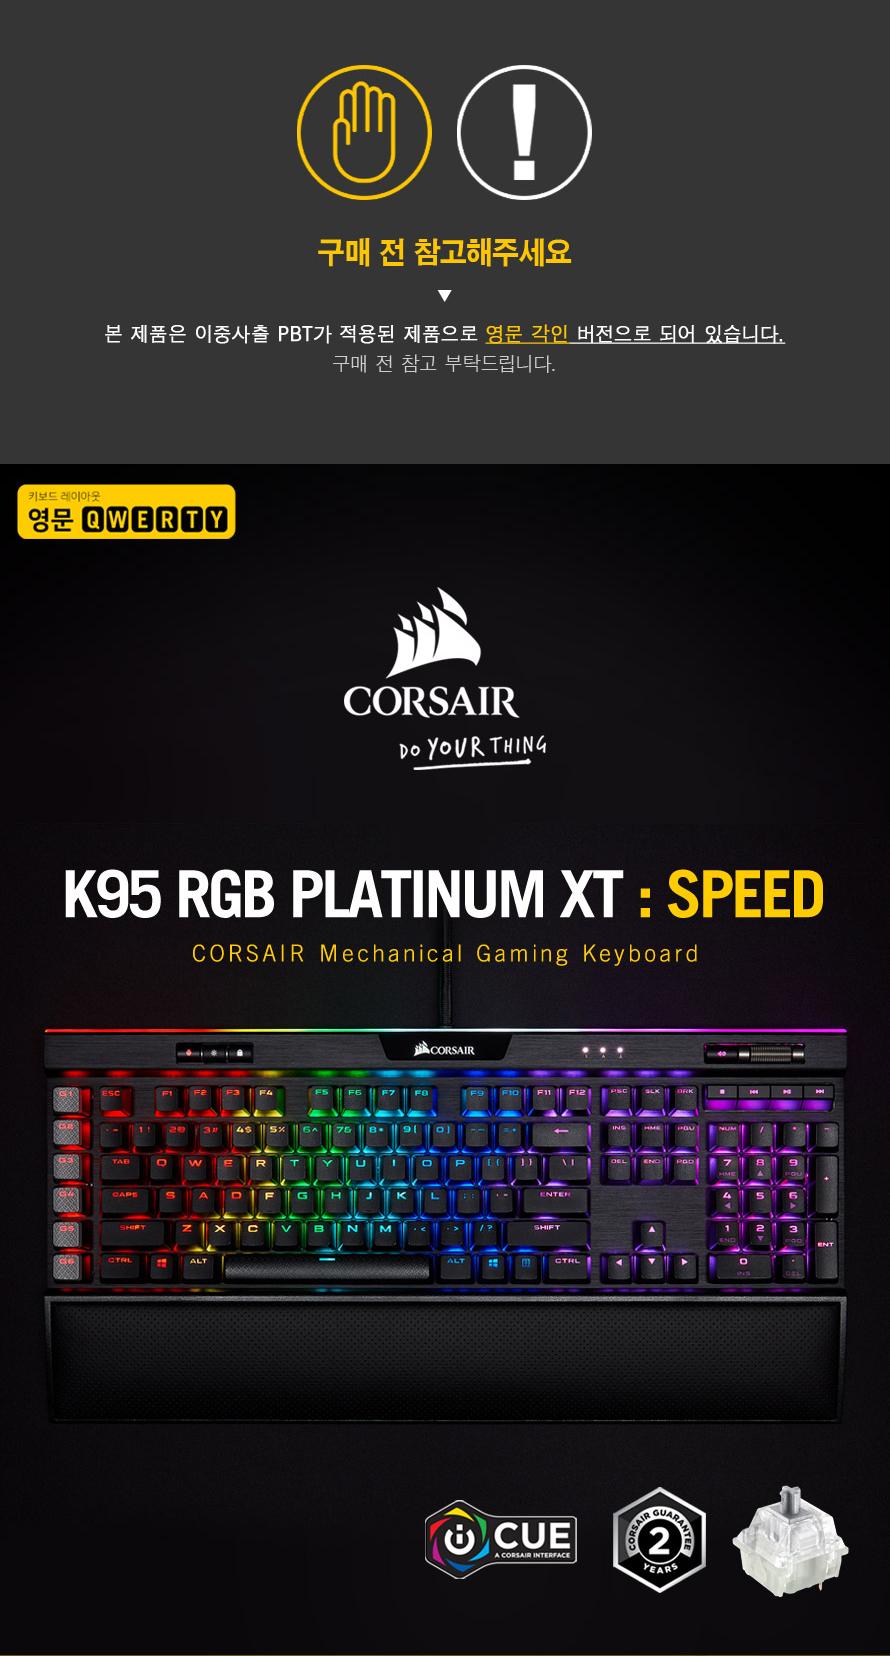 CORSAIR  K95 RGB PLATINUM XT(은축)